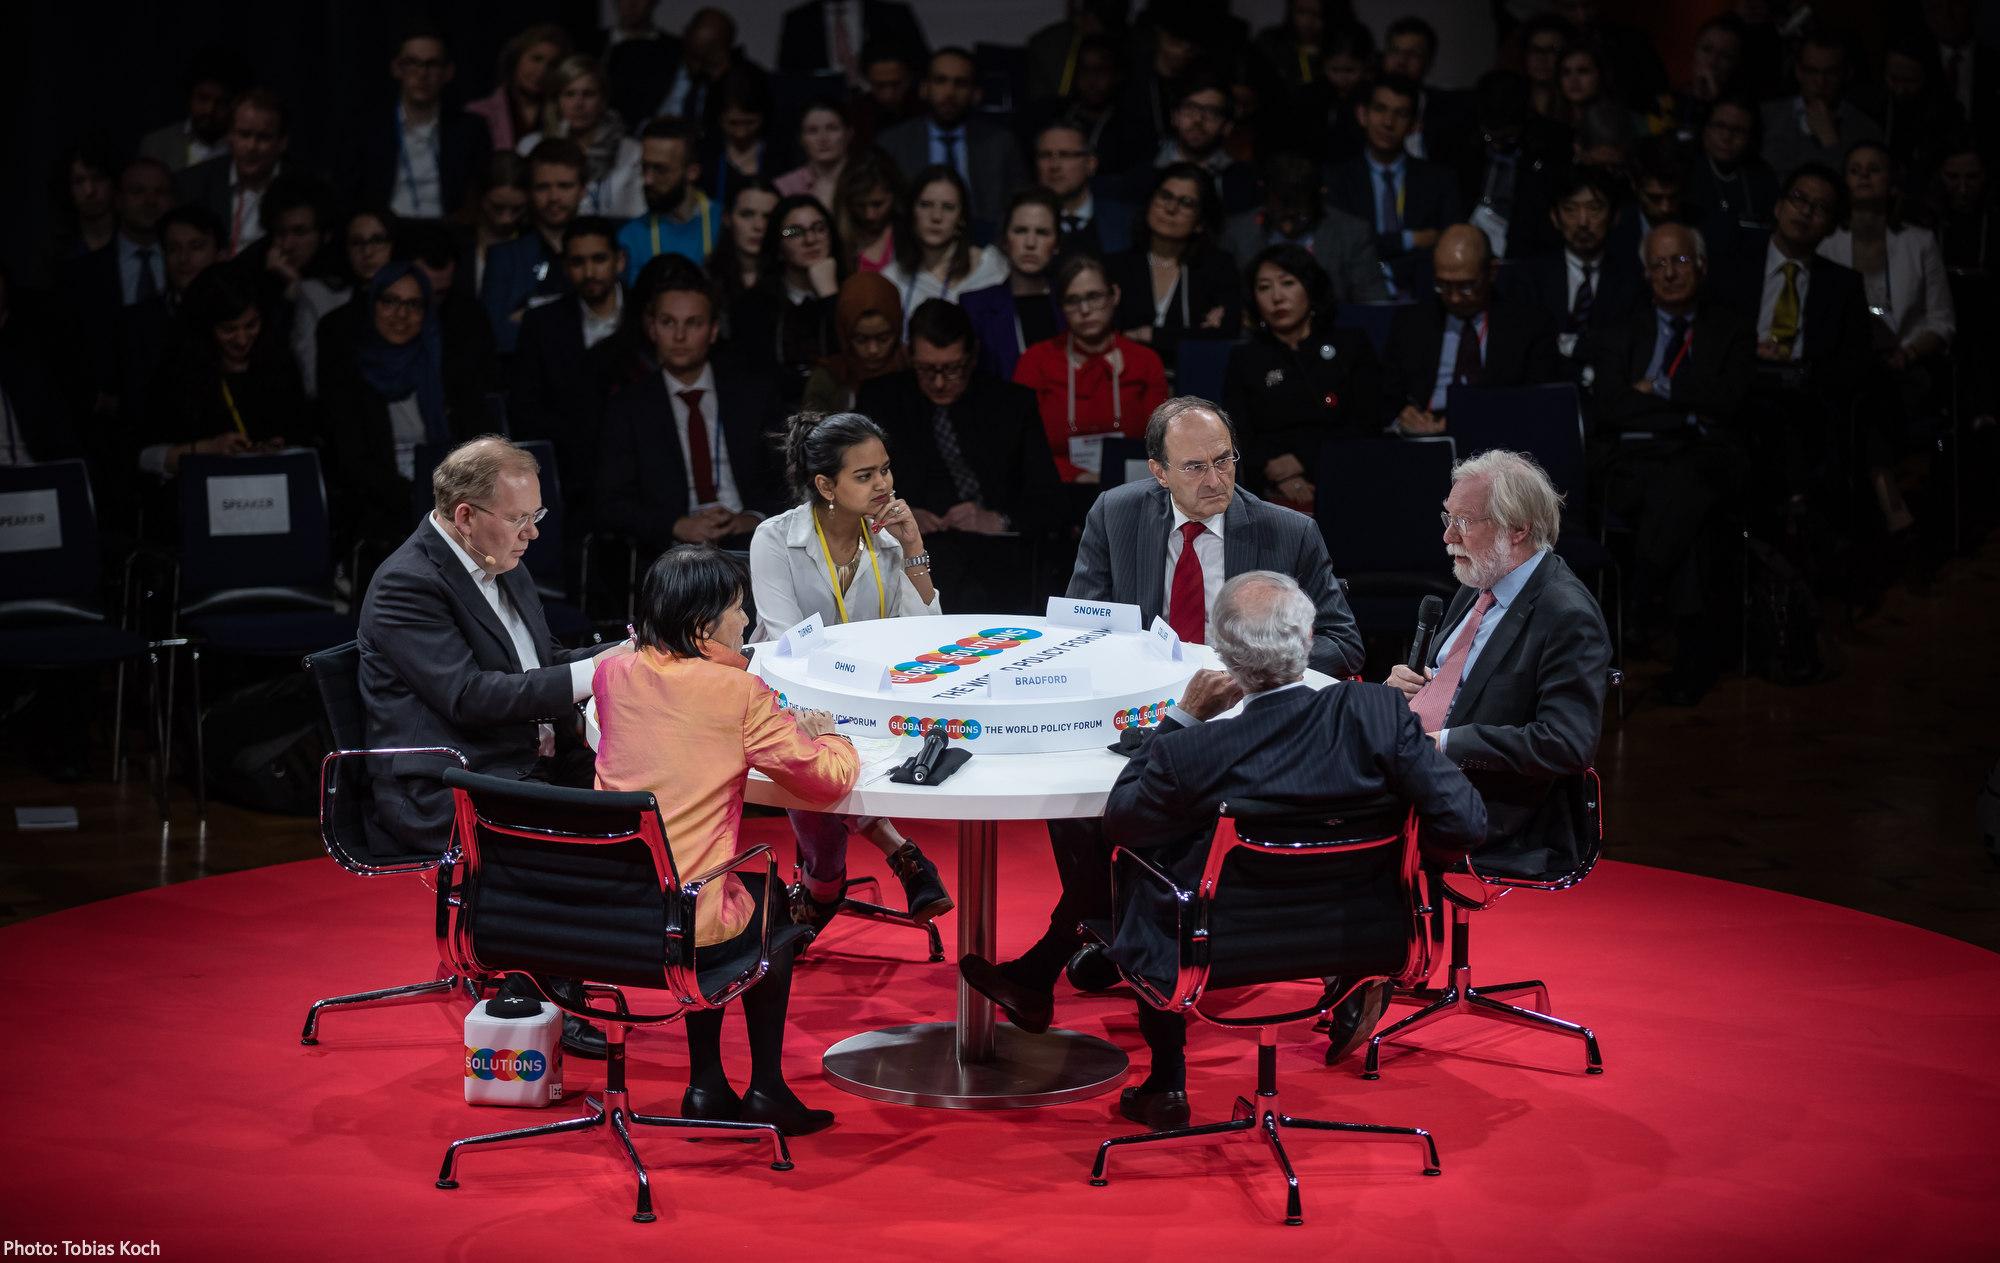 YGC Kavindya Thennakoon (Sri Lanka) joining the Closing Plenary at Global Solutions Summit